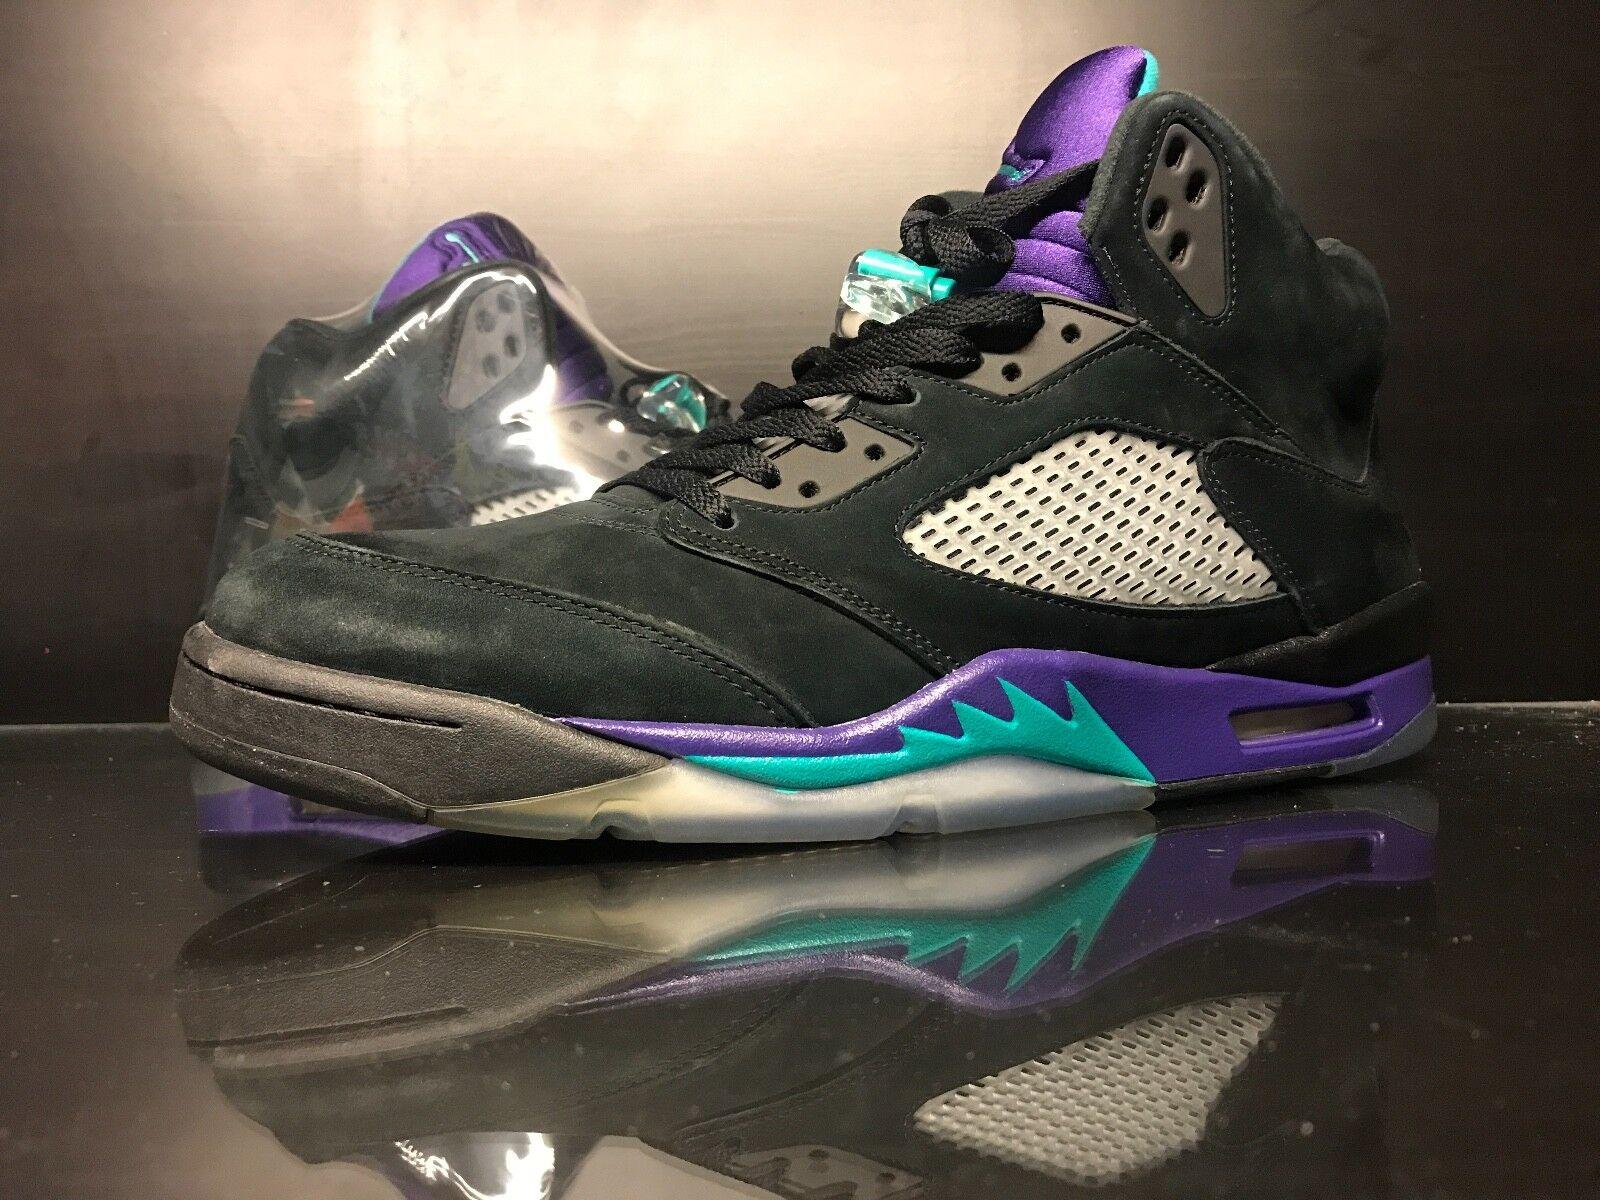 Air Jordan Black Grape 5 V - Size 14